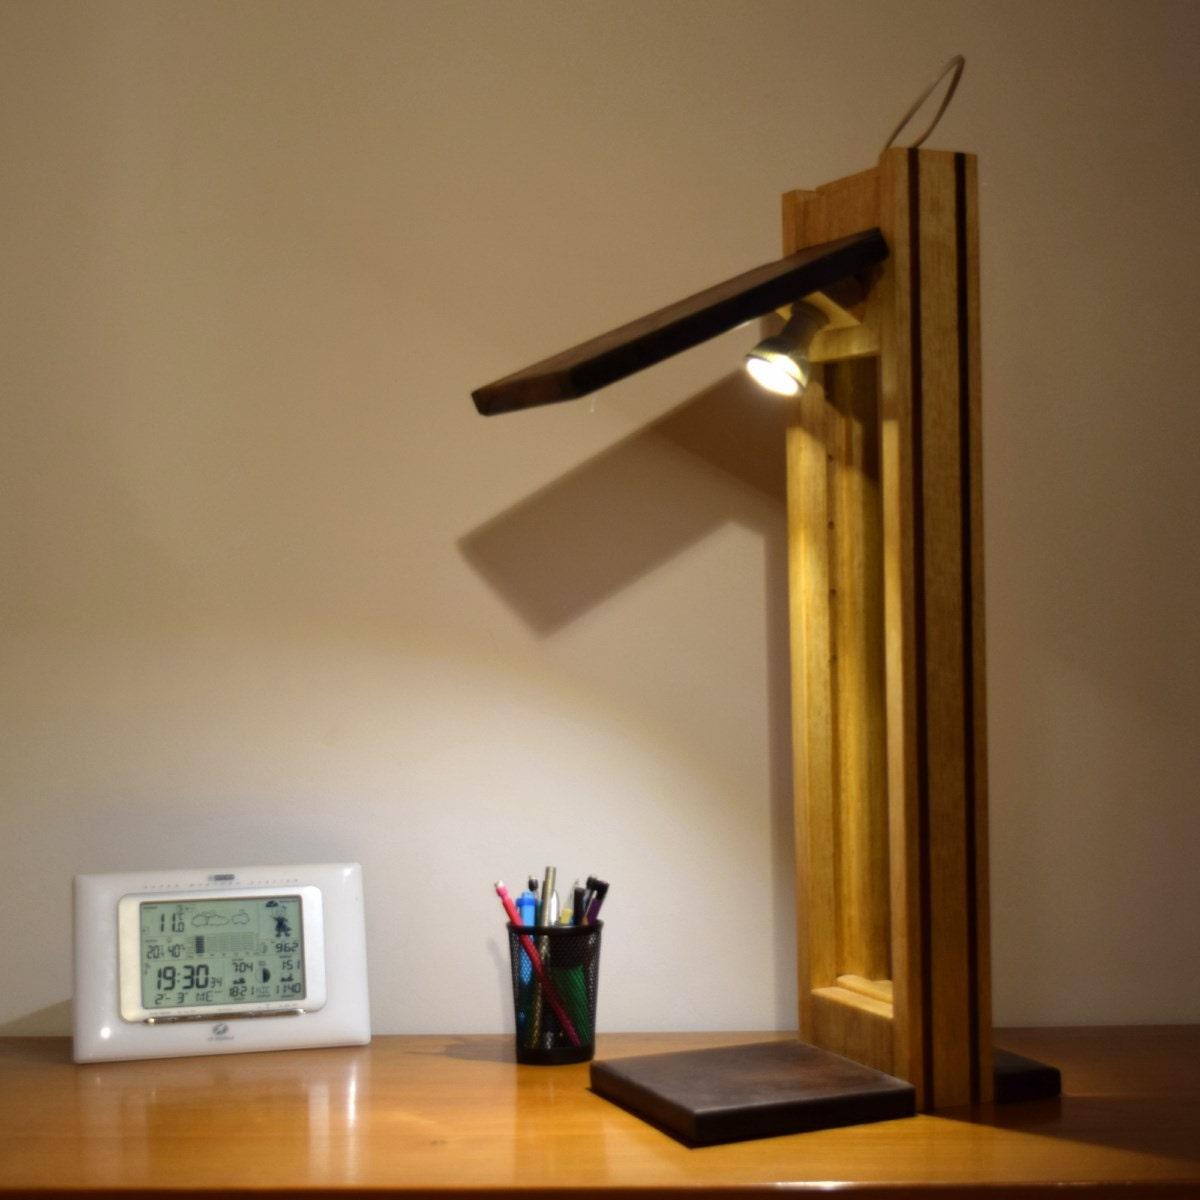 lampe de bureau design luxe bois massif clairage led